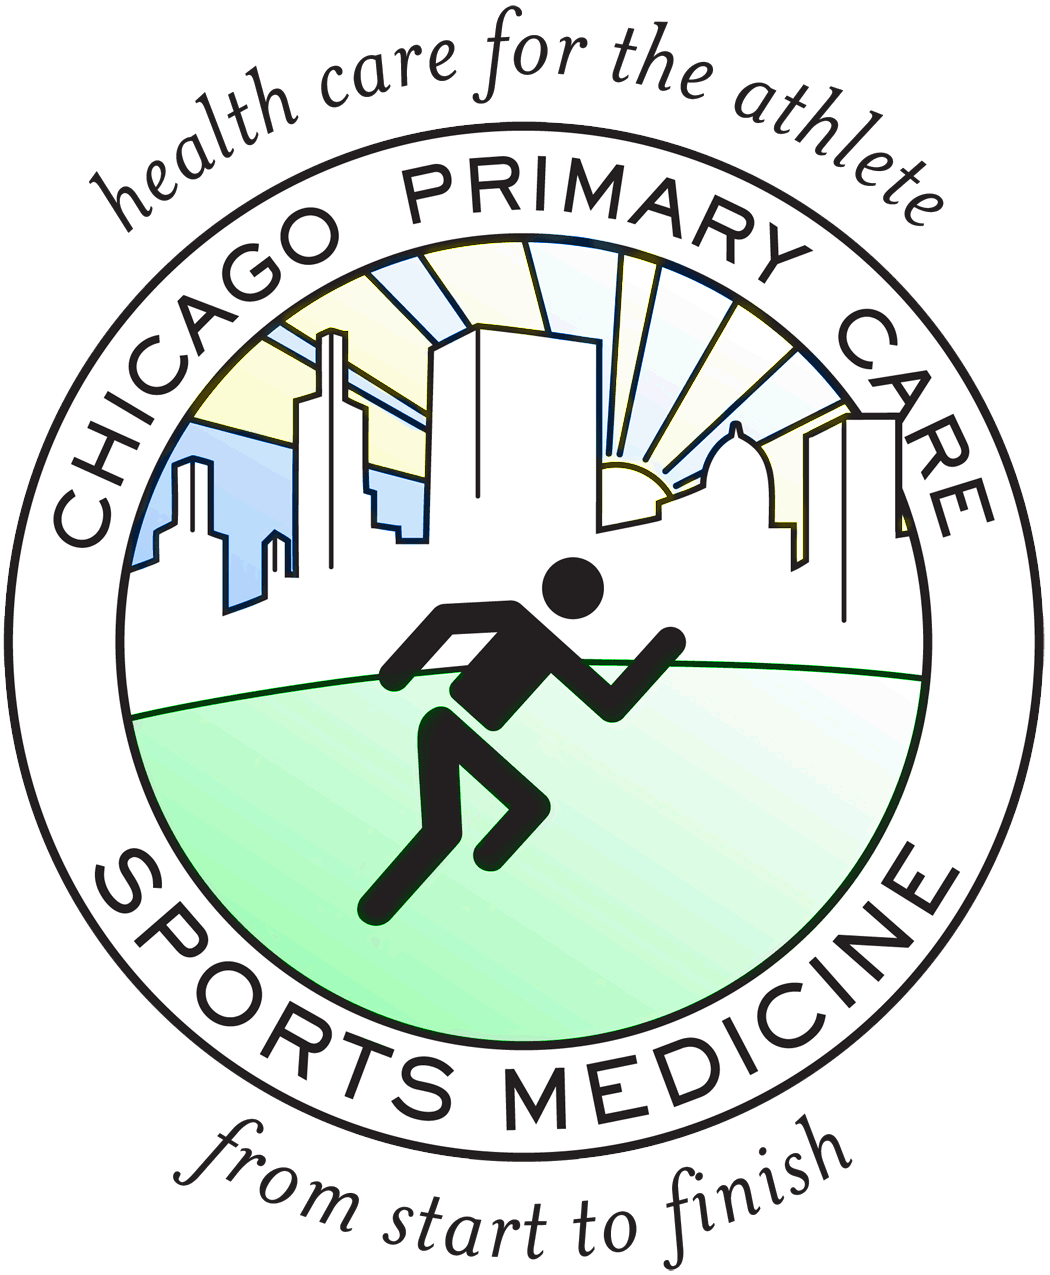 Chicago Primary Care Sports Medicine